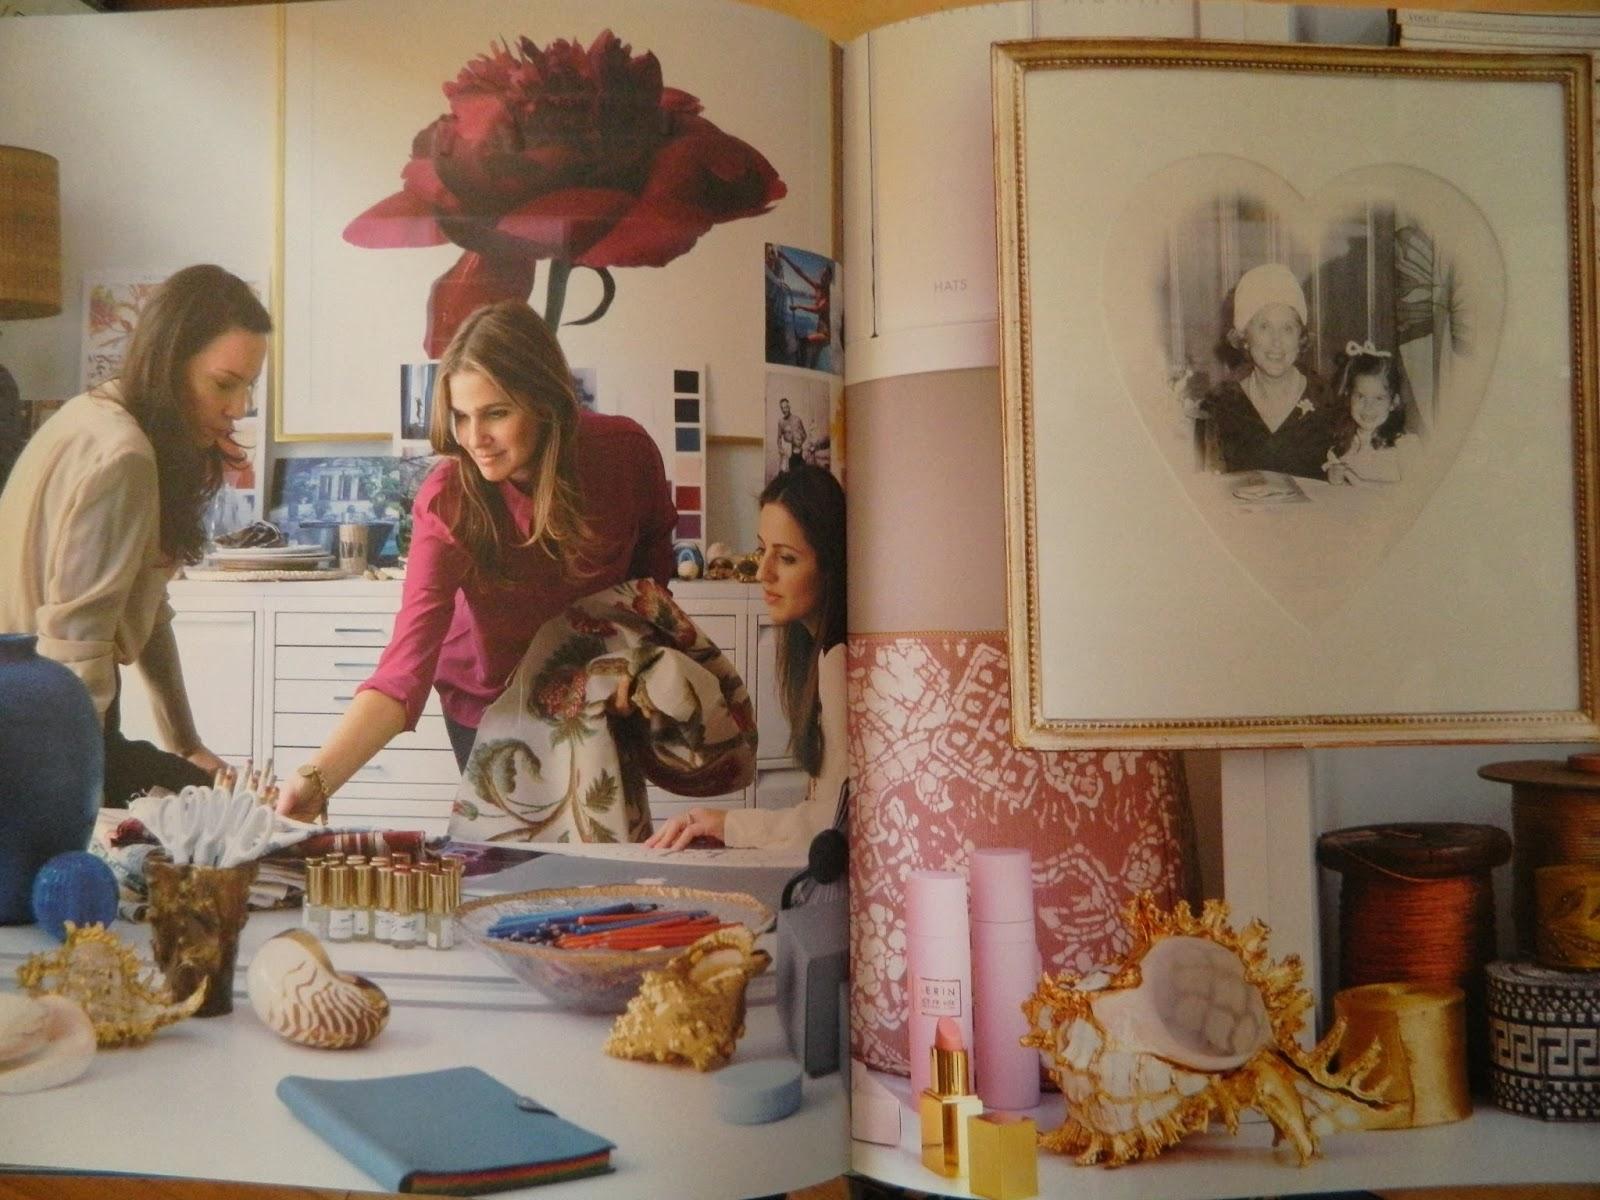 Aerin-Lauder-Beauty-At-Home-wallpaper-wp5403095